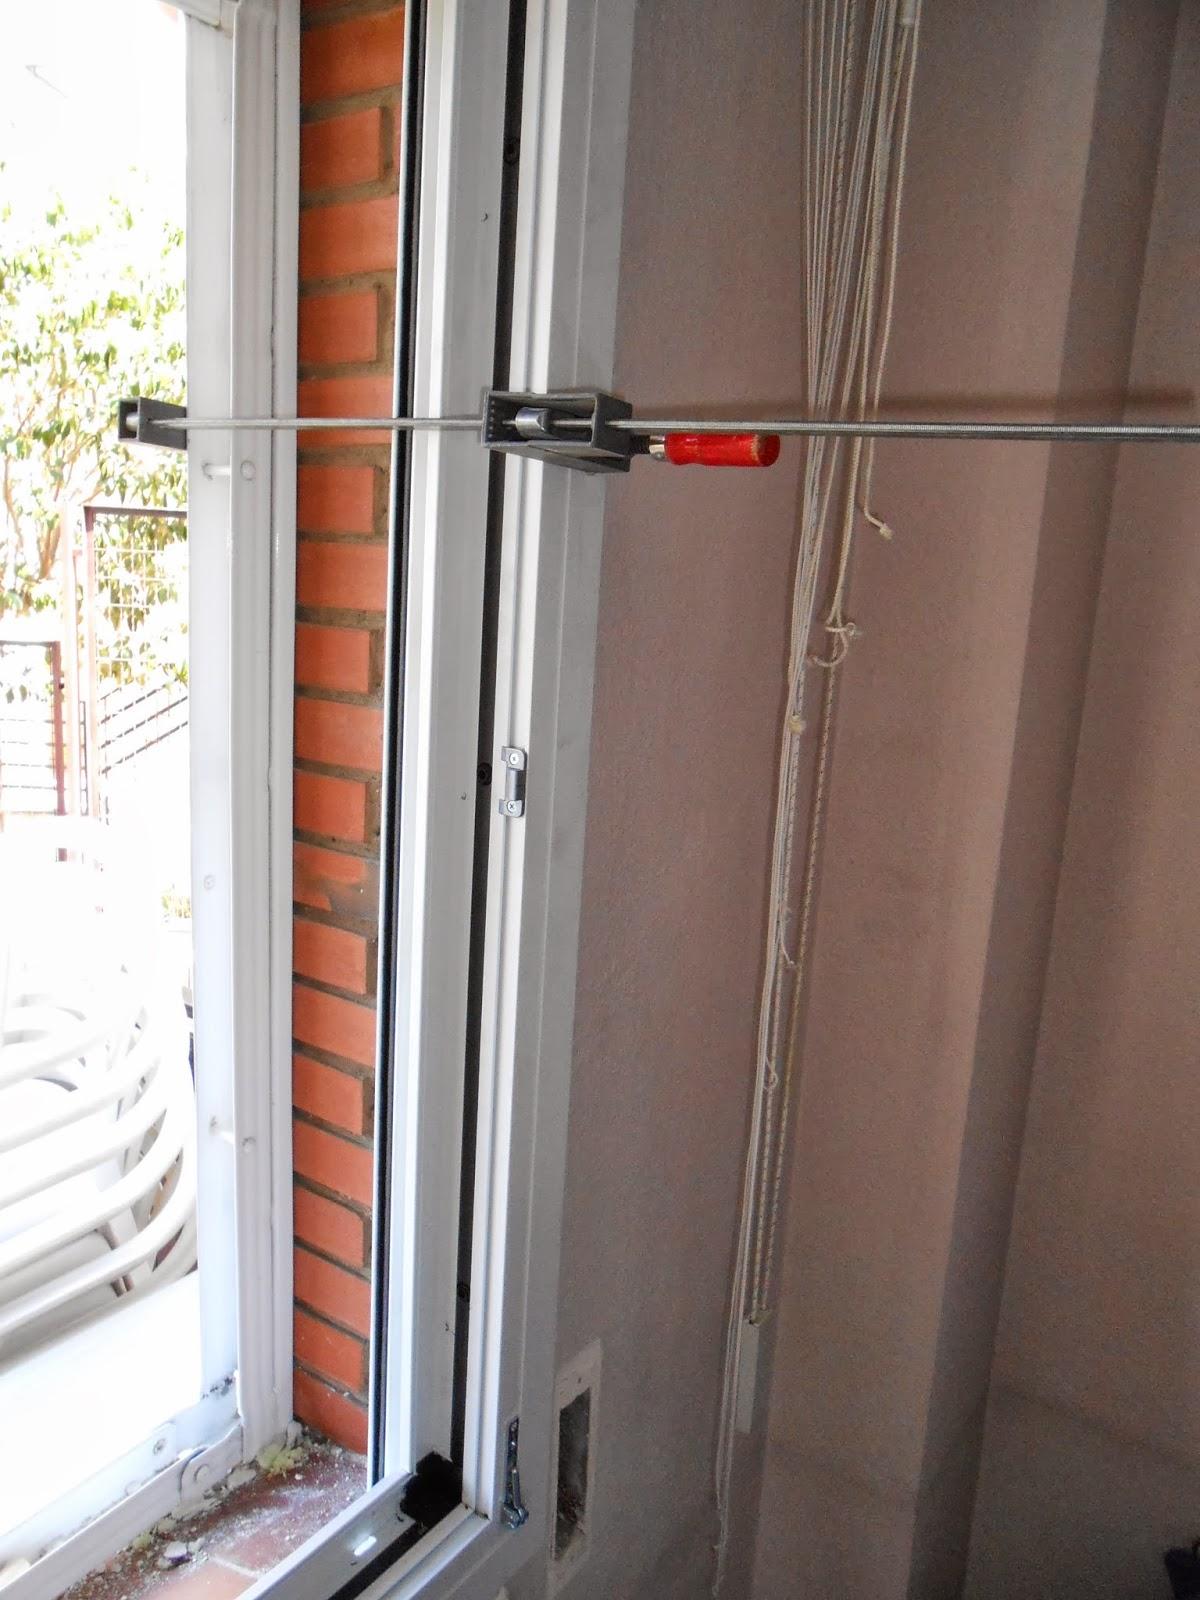 Ventanas de aluminio elegantes puigsoler ventanas y for Pvc o aluminio precios